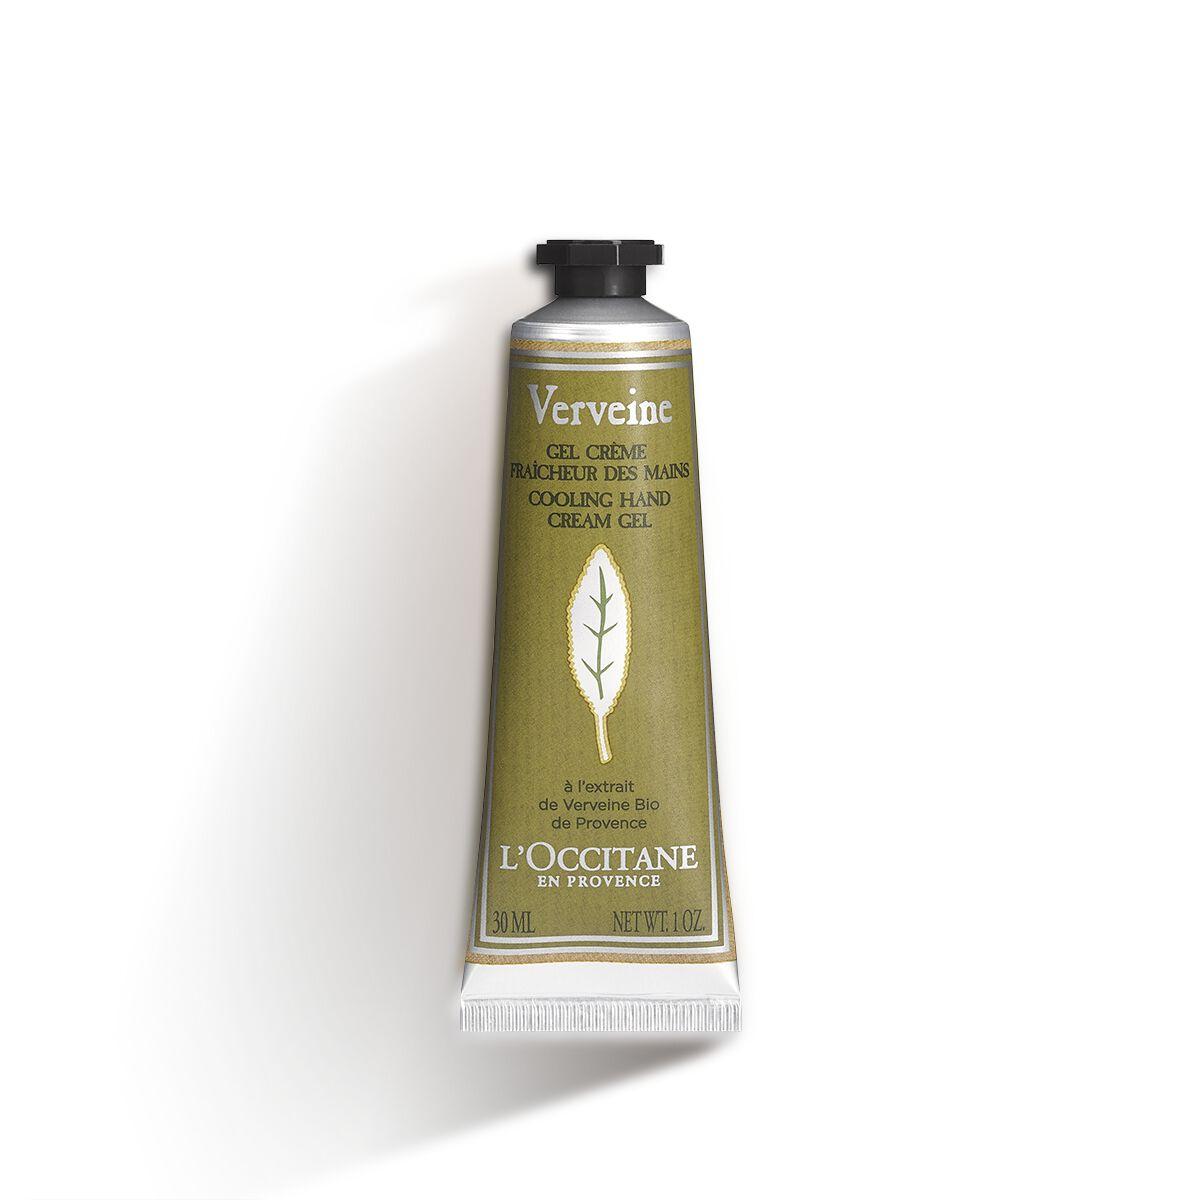 Verbena Cooling Hand Cream Gel 1 oz.